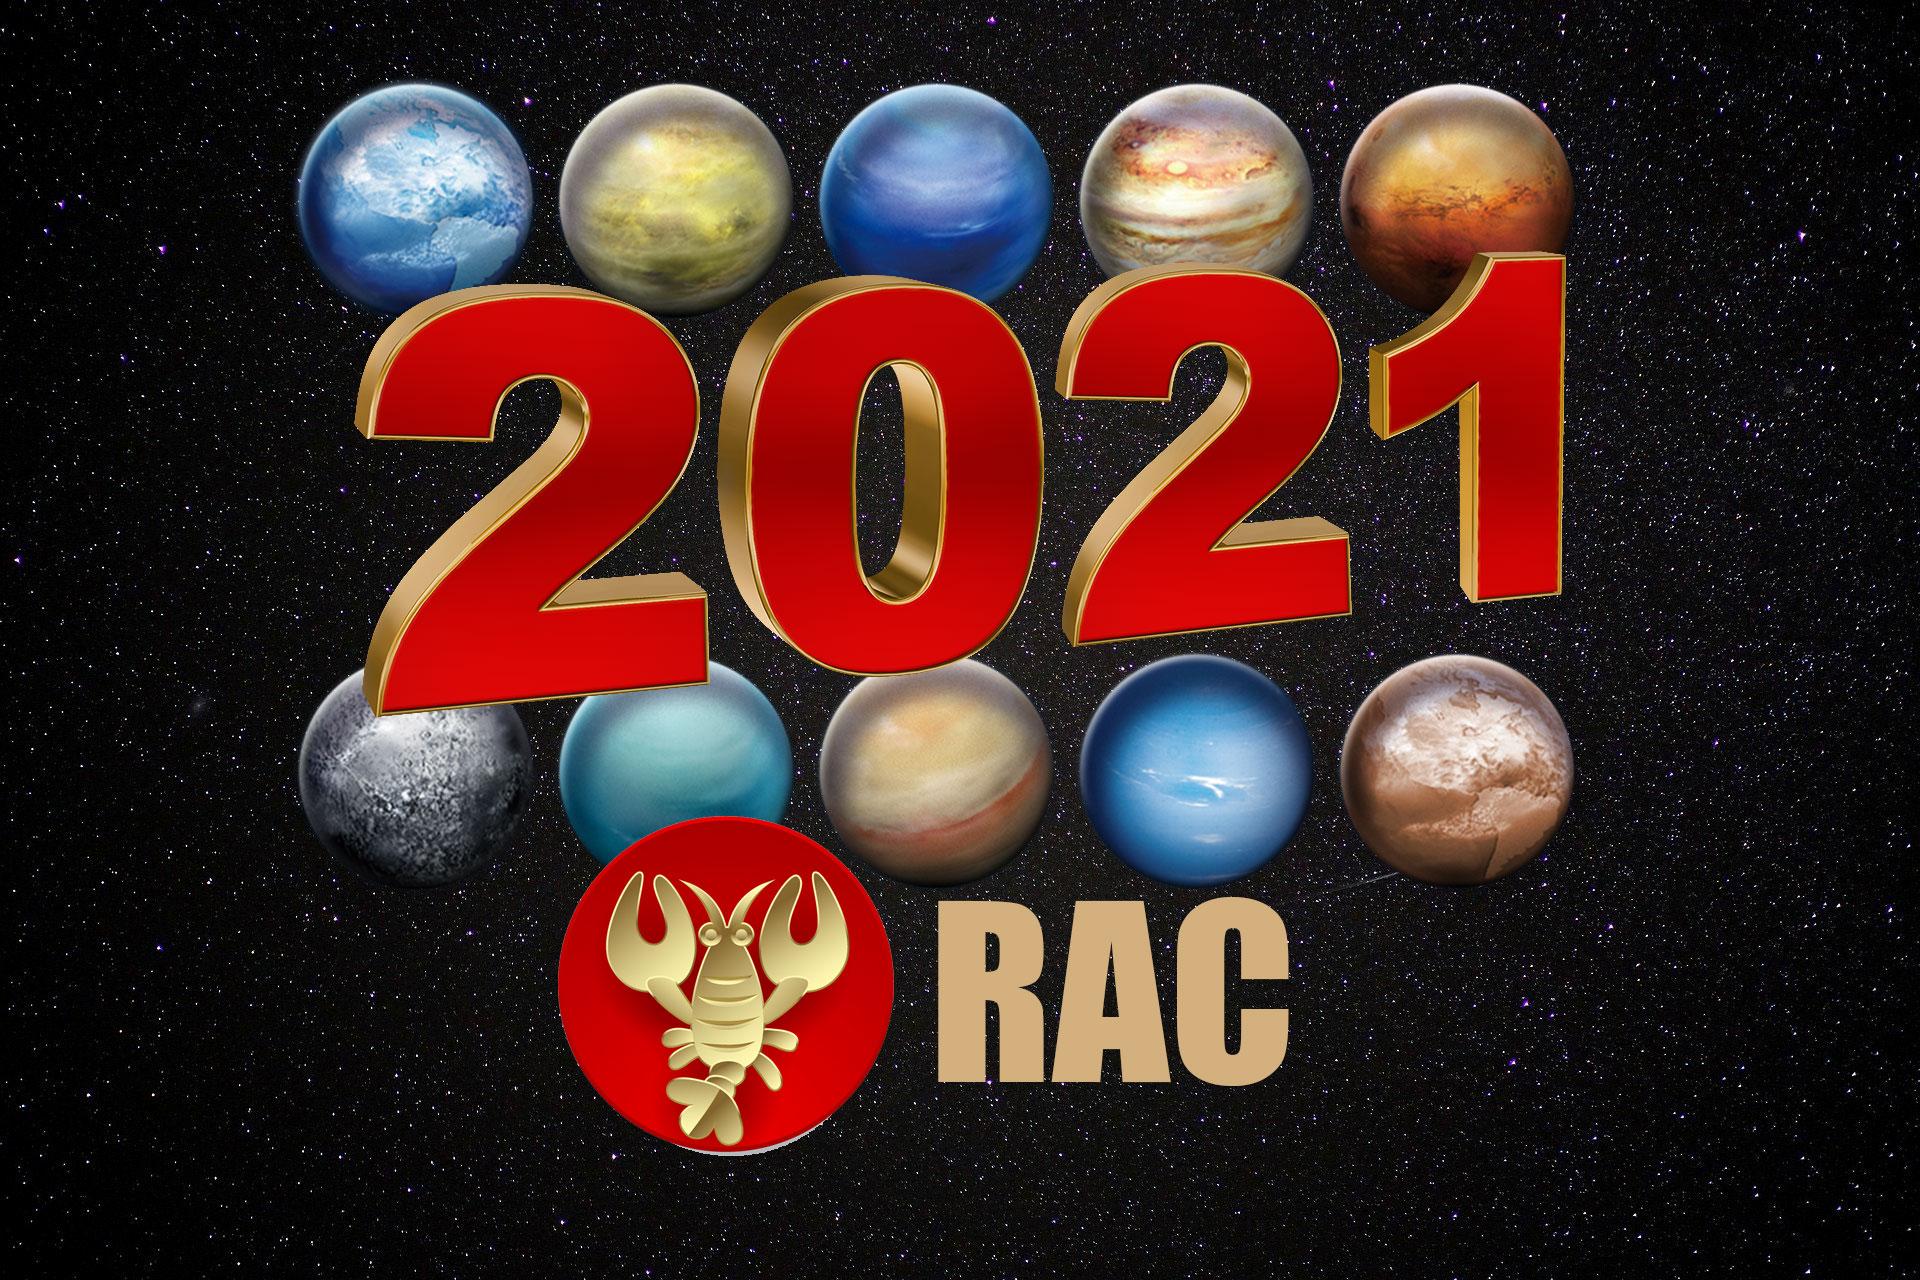 Horoscop 2021 Rac - bani, sănătate, dragoste. Decizii grele pe plan profesional